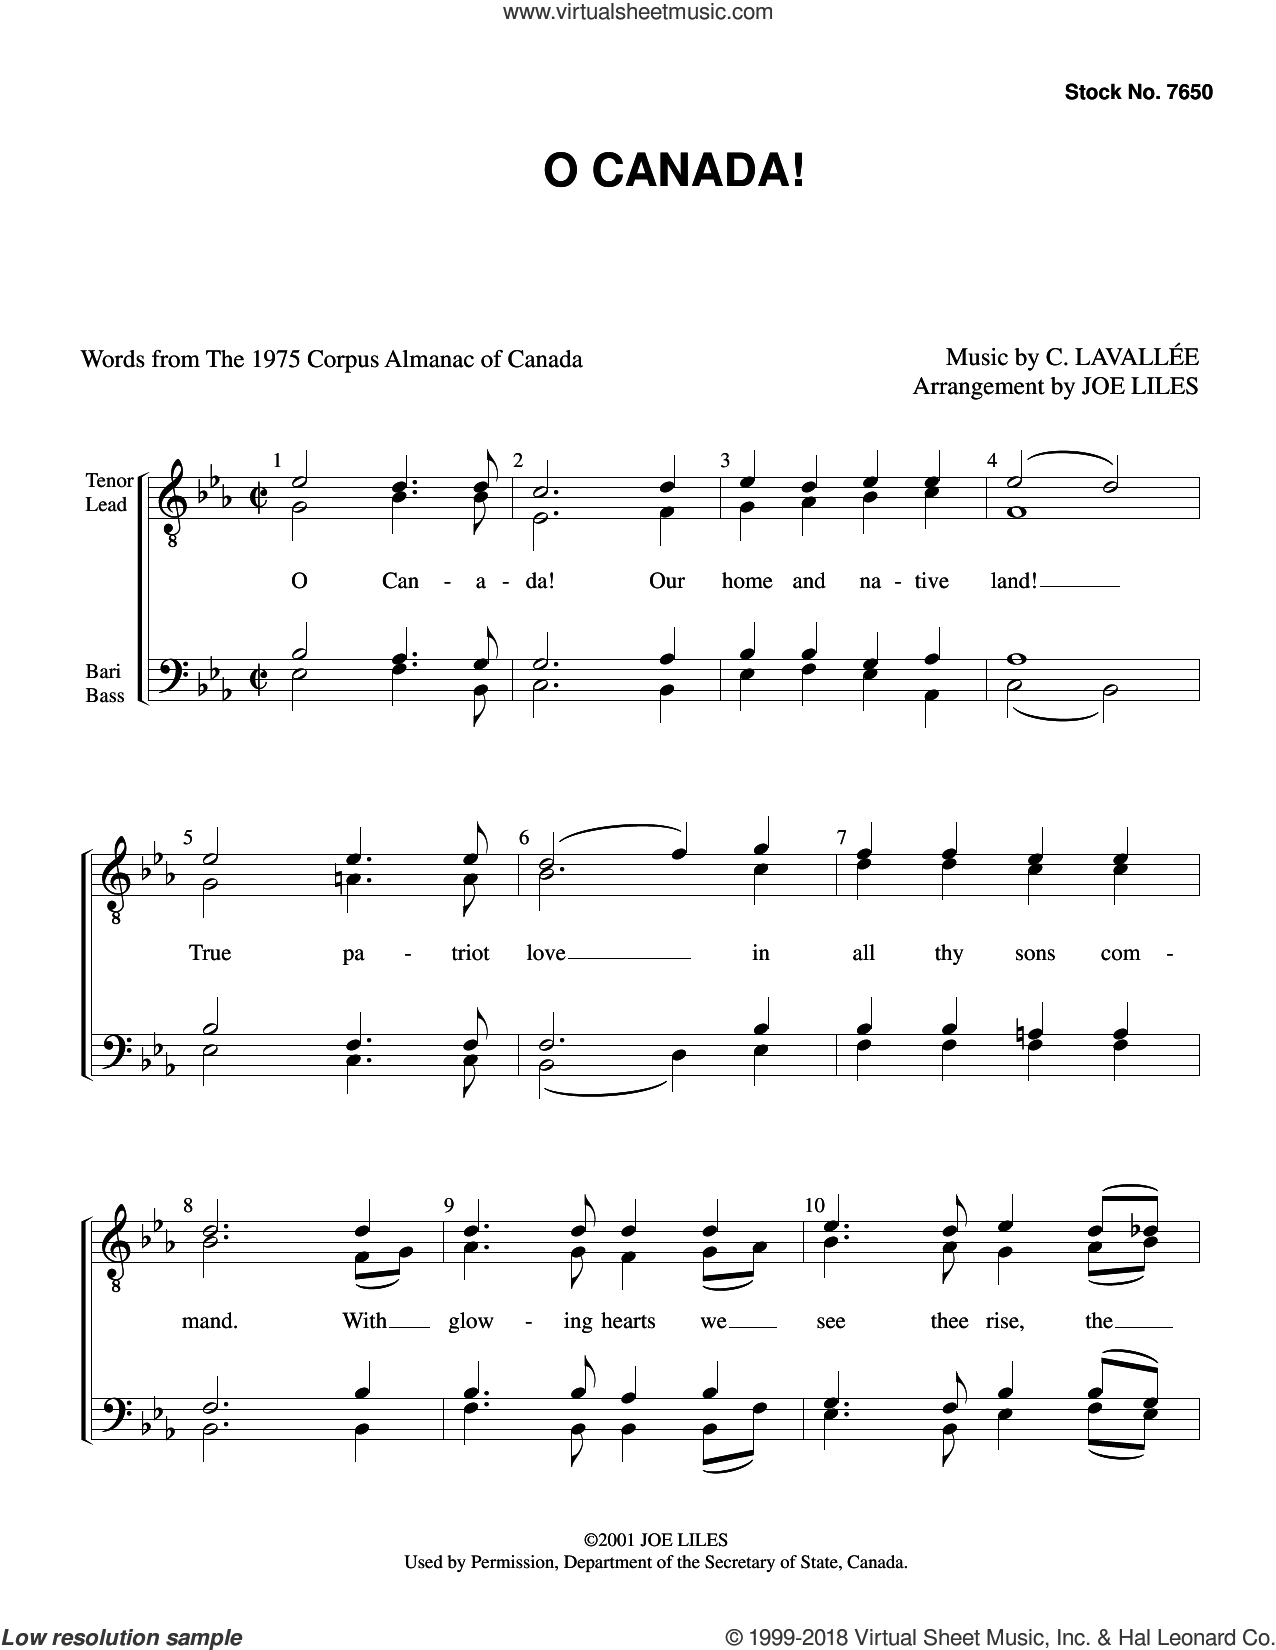 O Canada! (arr. Joe Liles) sheet music for choir (TTBB: tenor, bass) by Calixa Lavallee, Joe Liles, Calixa Lavallee and Justice R.S. Weir, intermediate skill level